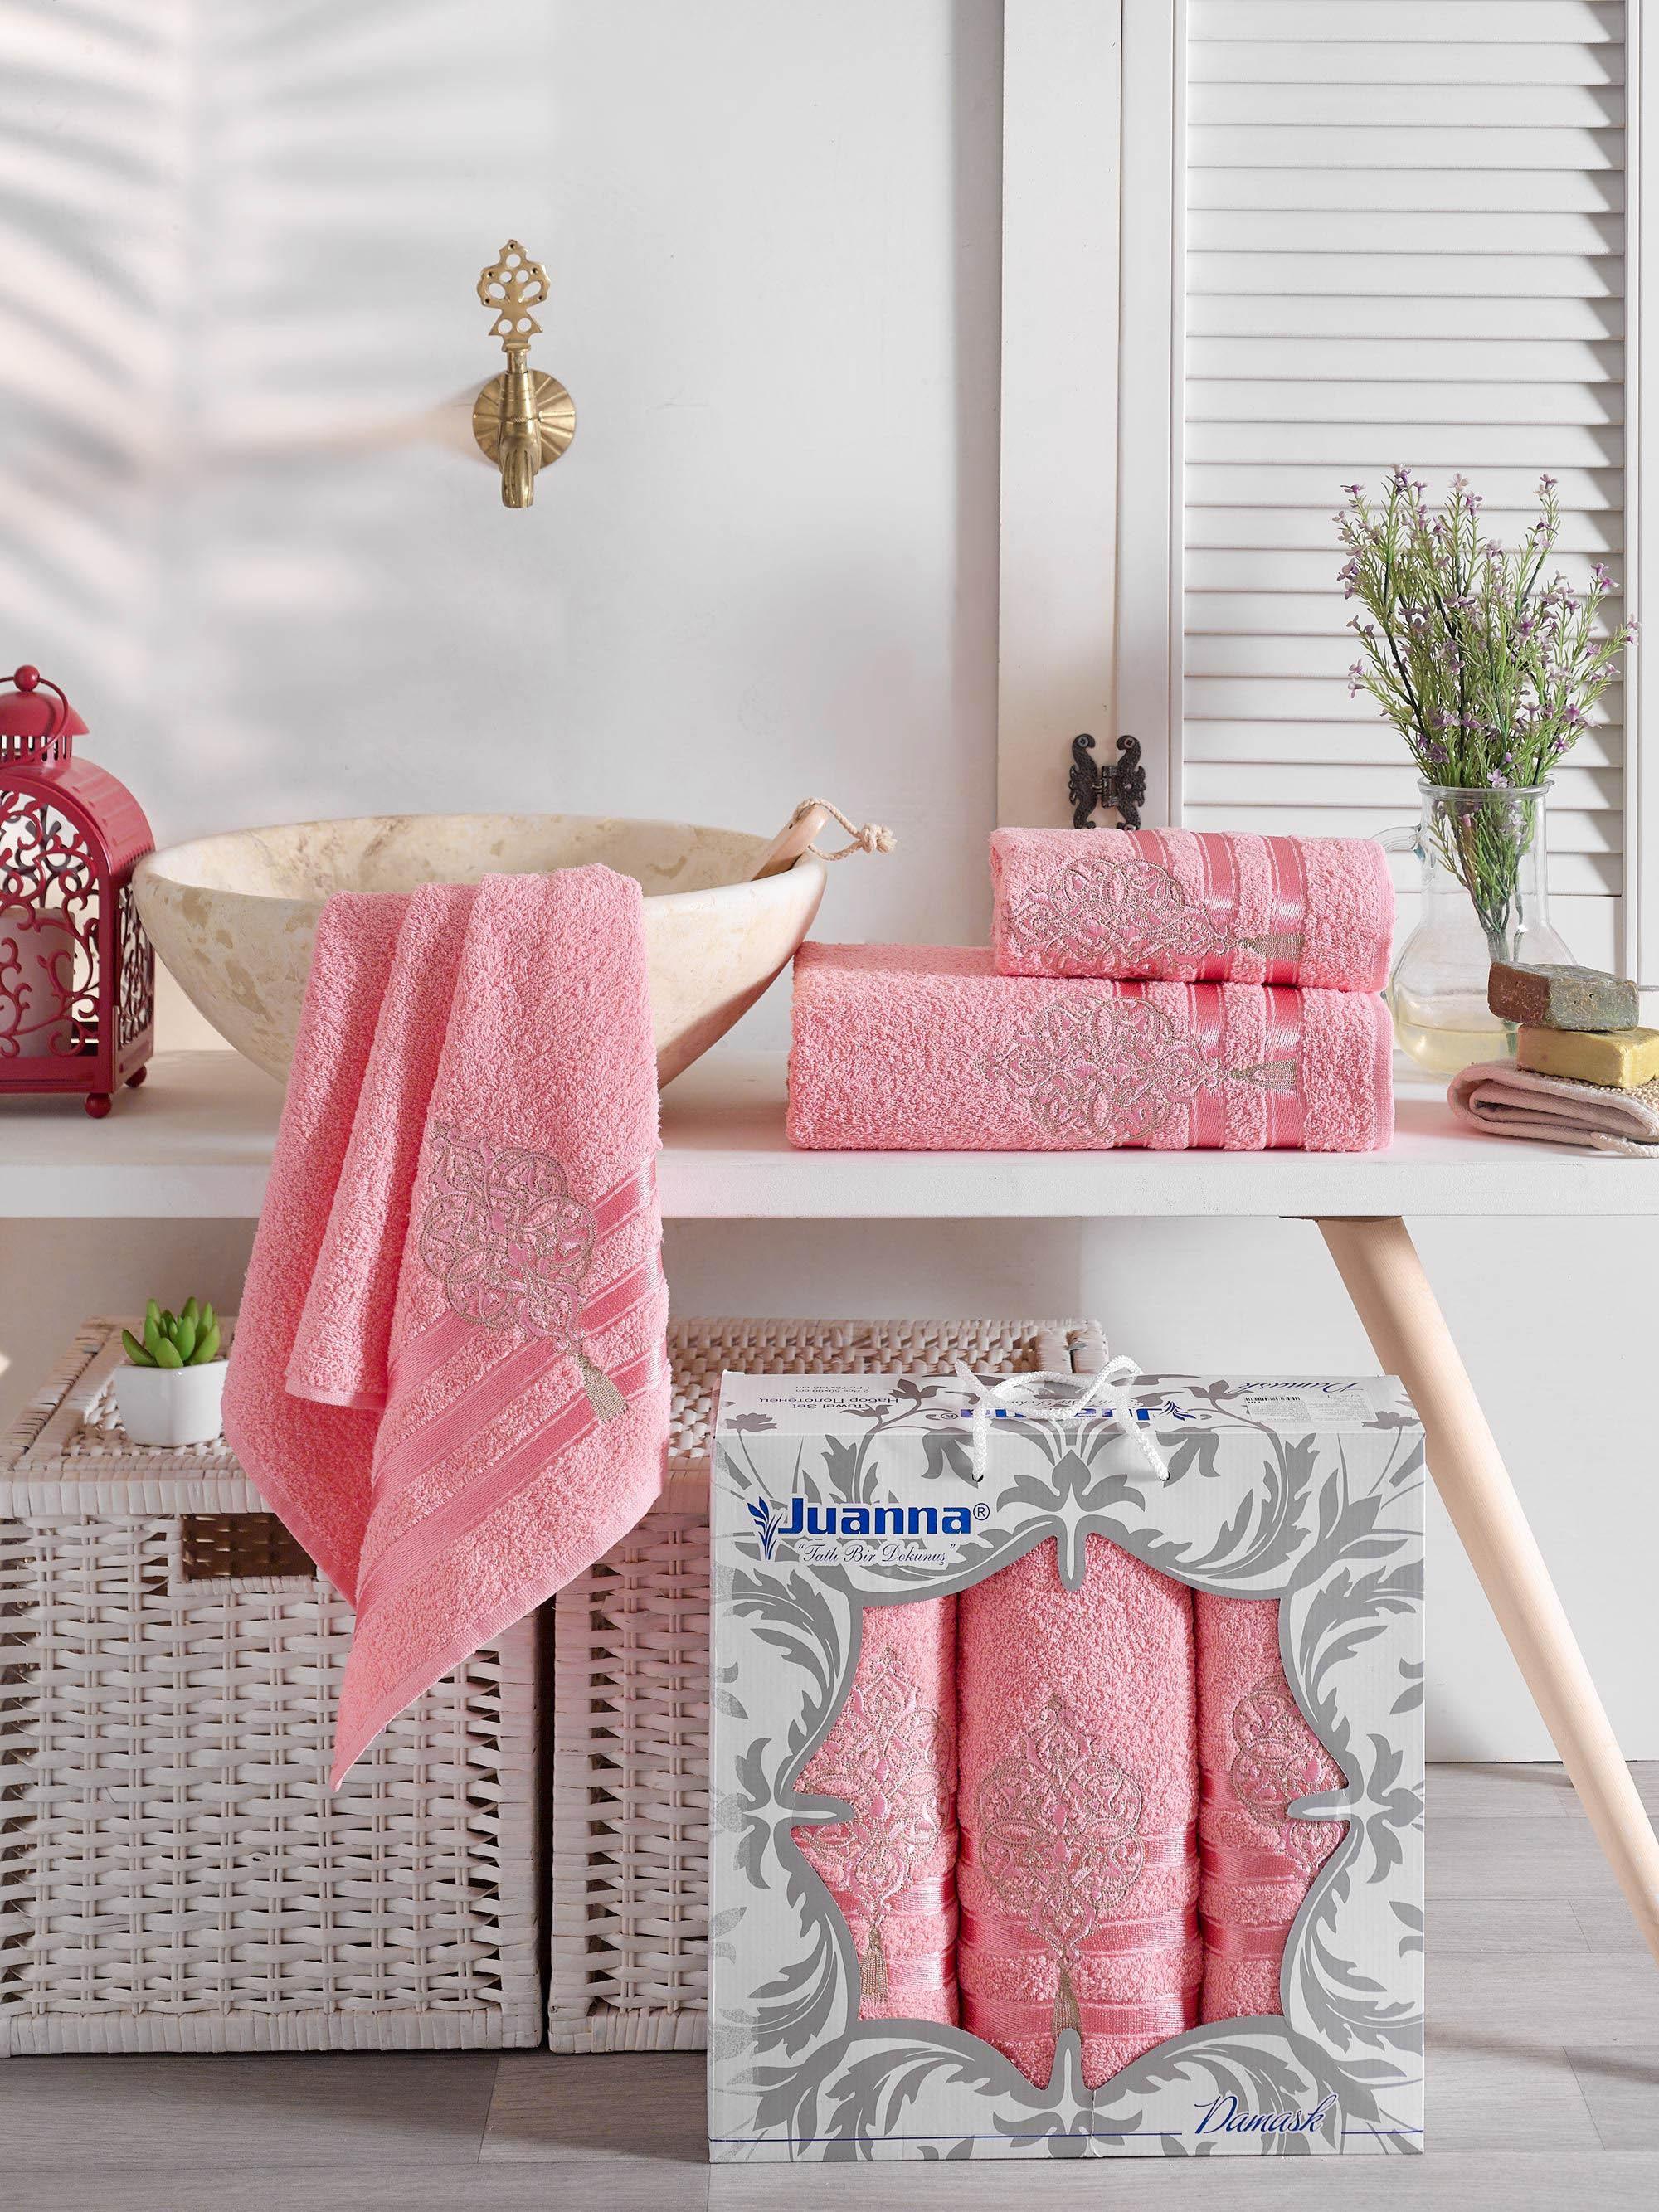 Полотенца Juanna Полотенце Damask Цвет: Розовый (50х90 см - 2 шт,70х140 см) набор из 3 полотенец merzuka sakura 50х90 2 70х140 8432 терракотовый